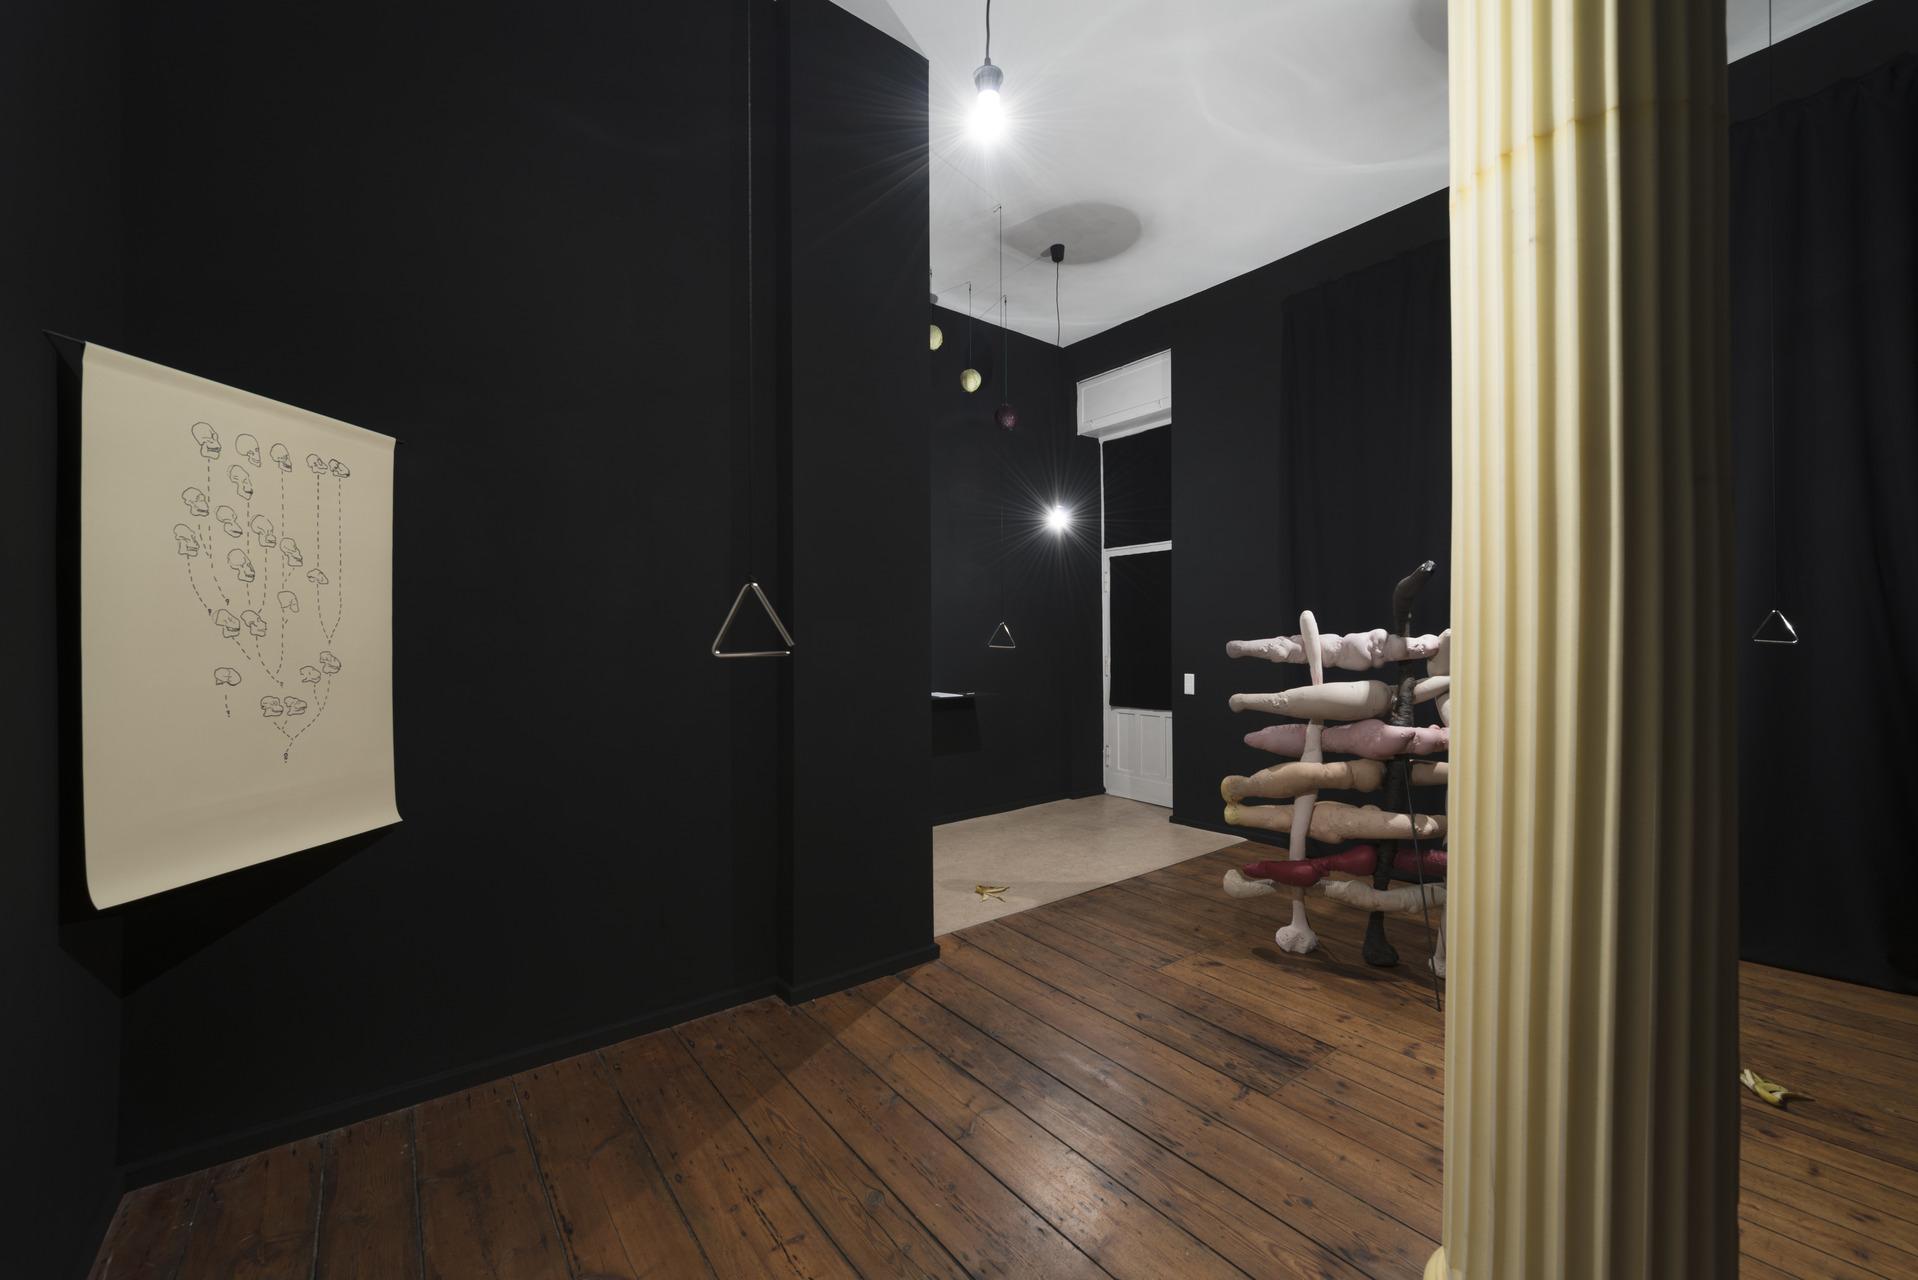 TGood Kinderhook exhibition 19 03 2015 _0031